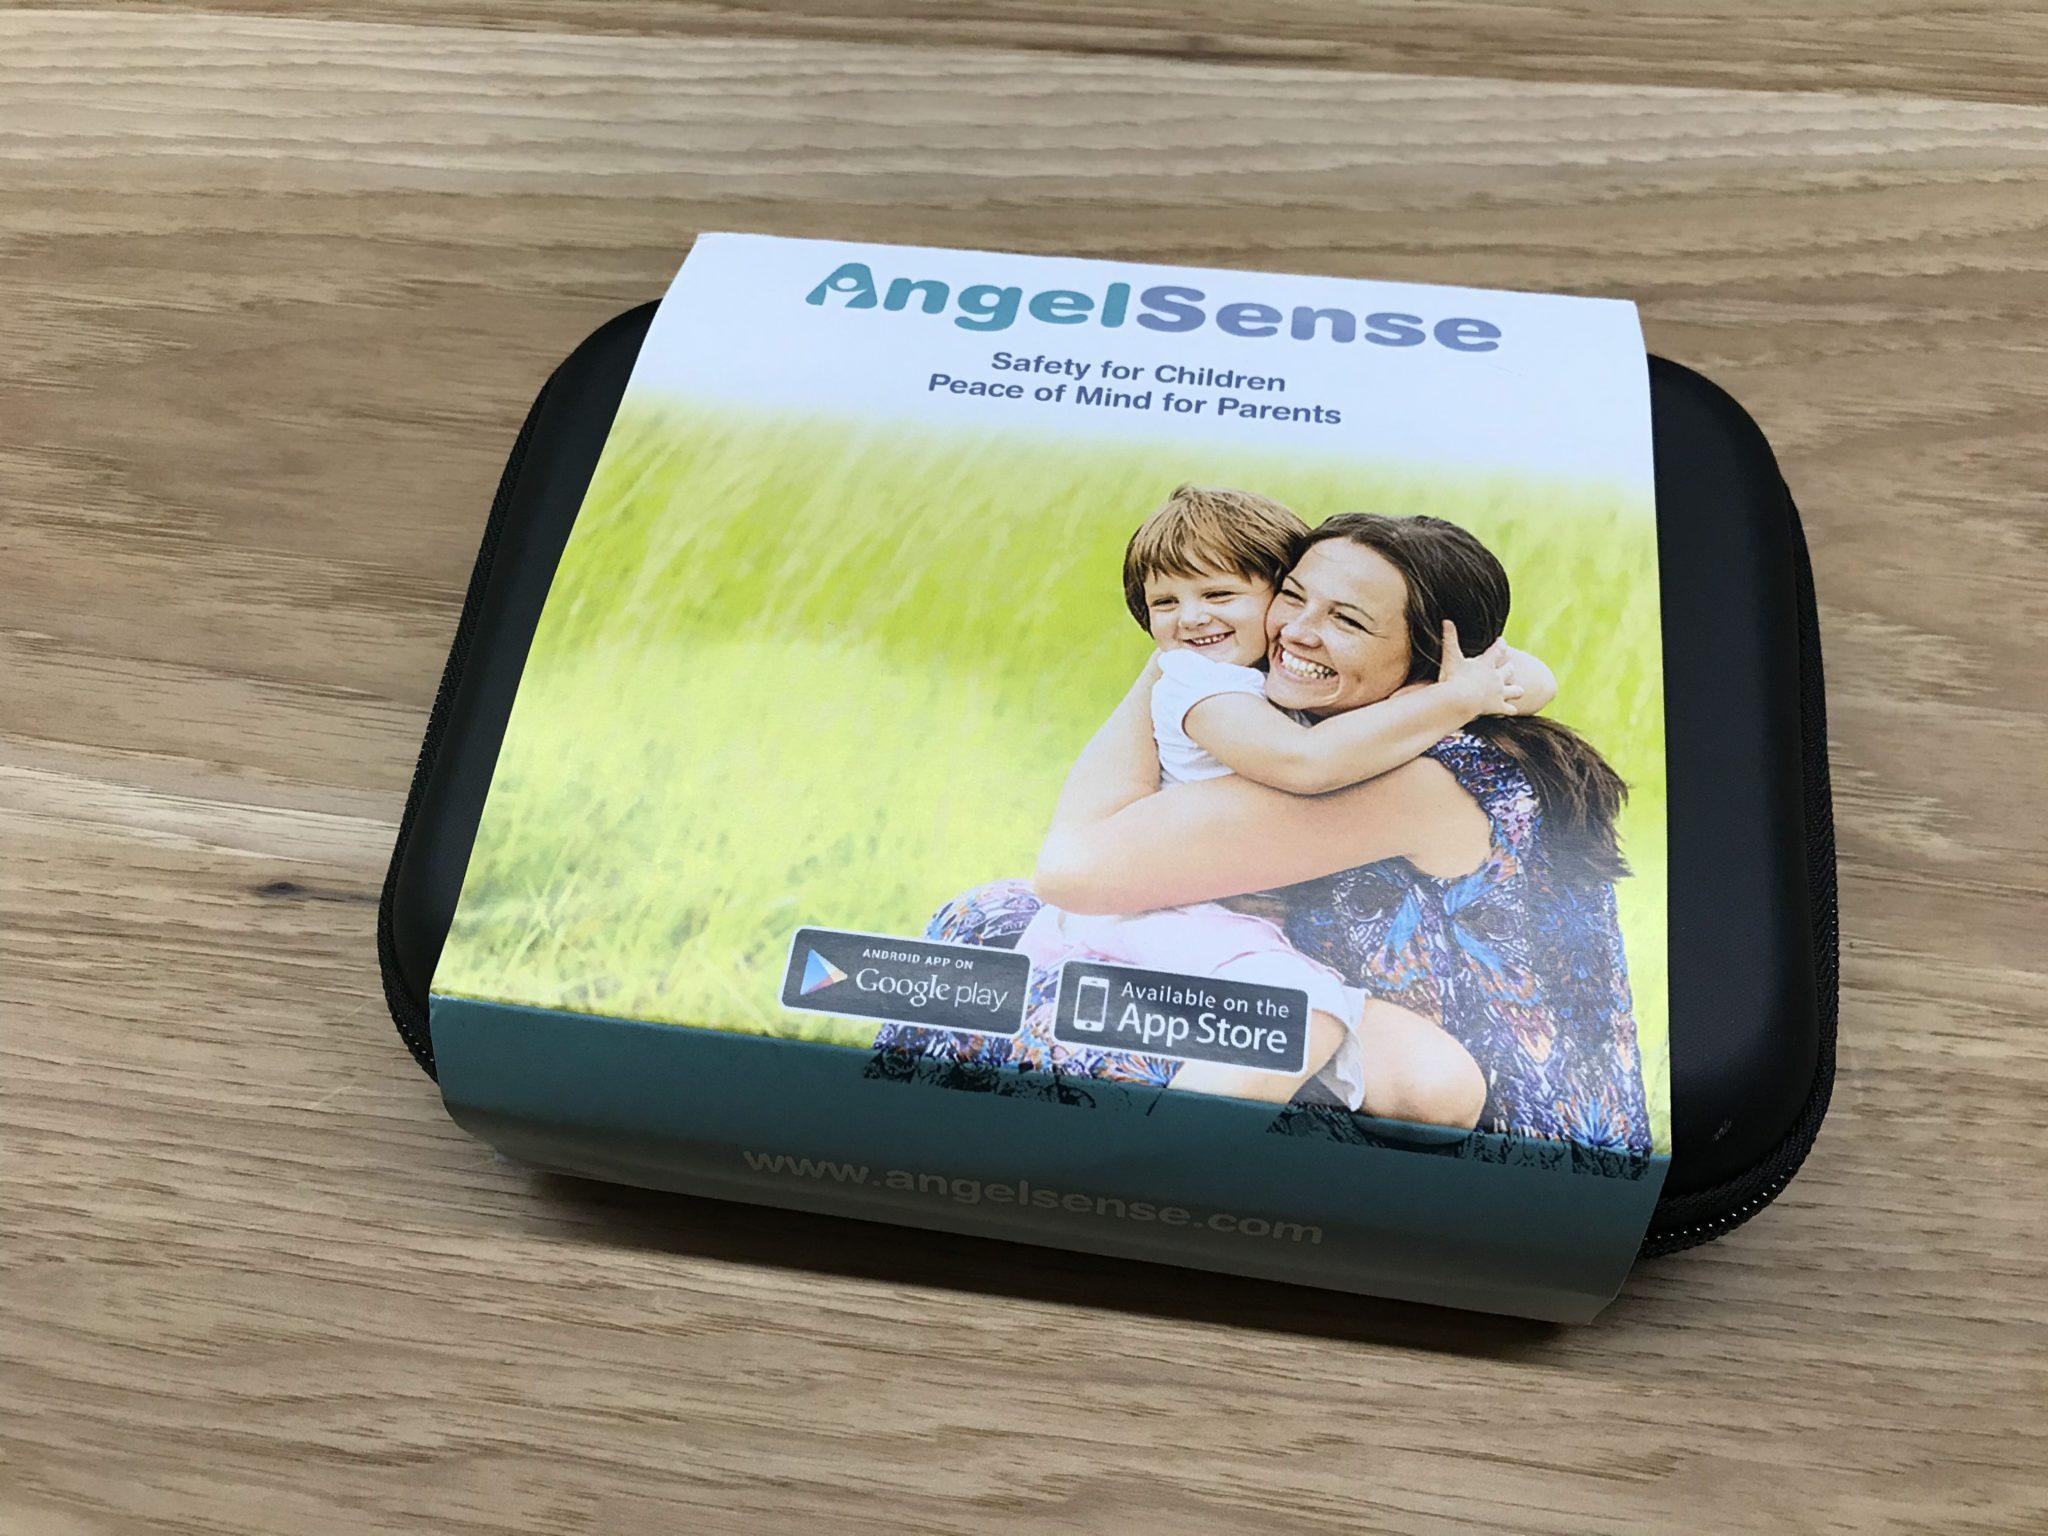 angel sense device in packaging